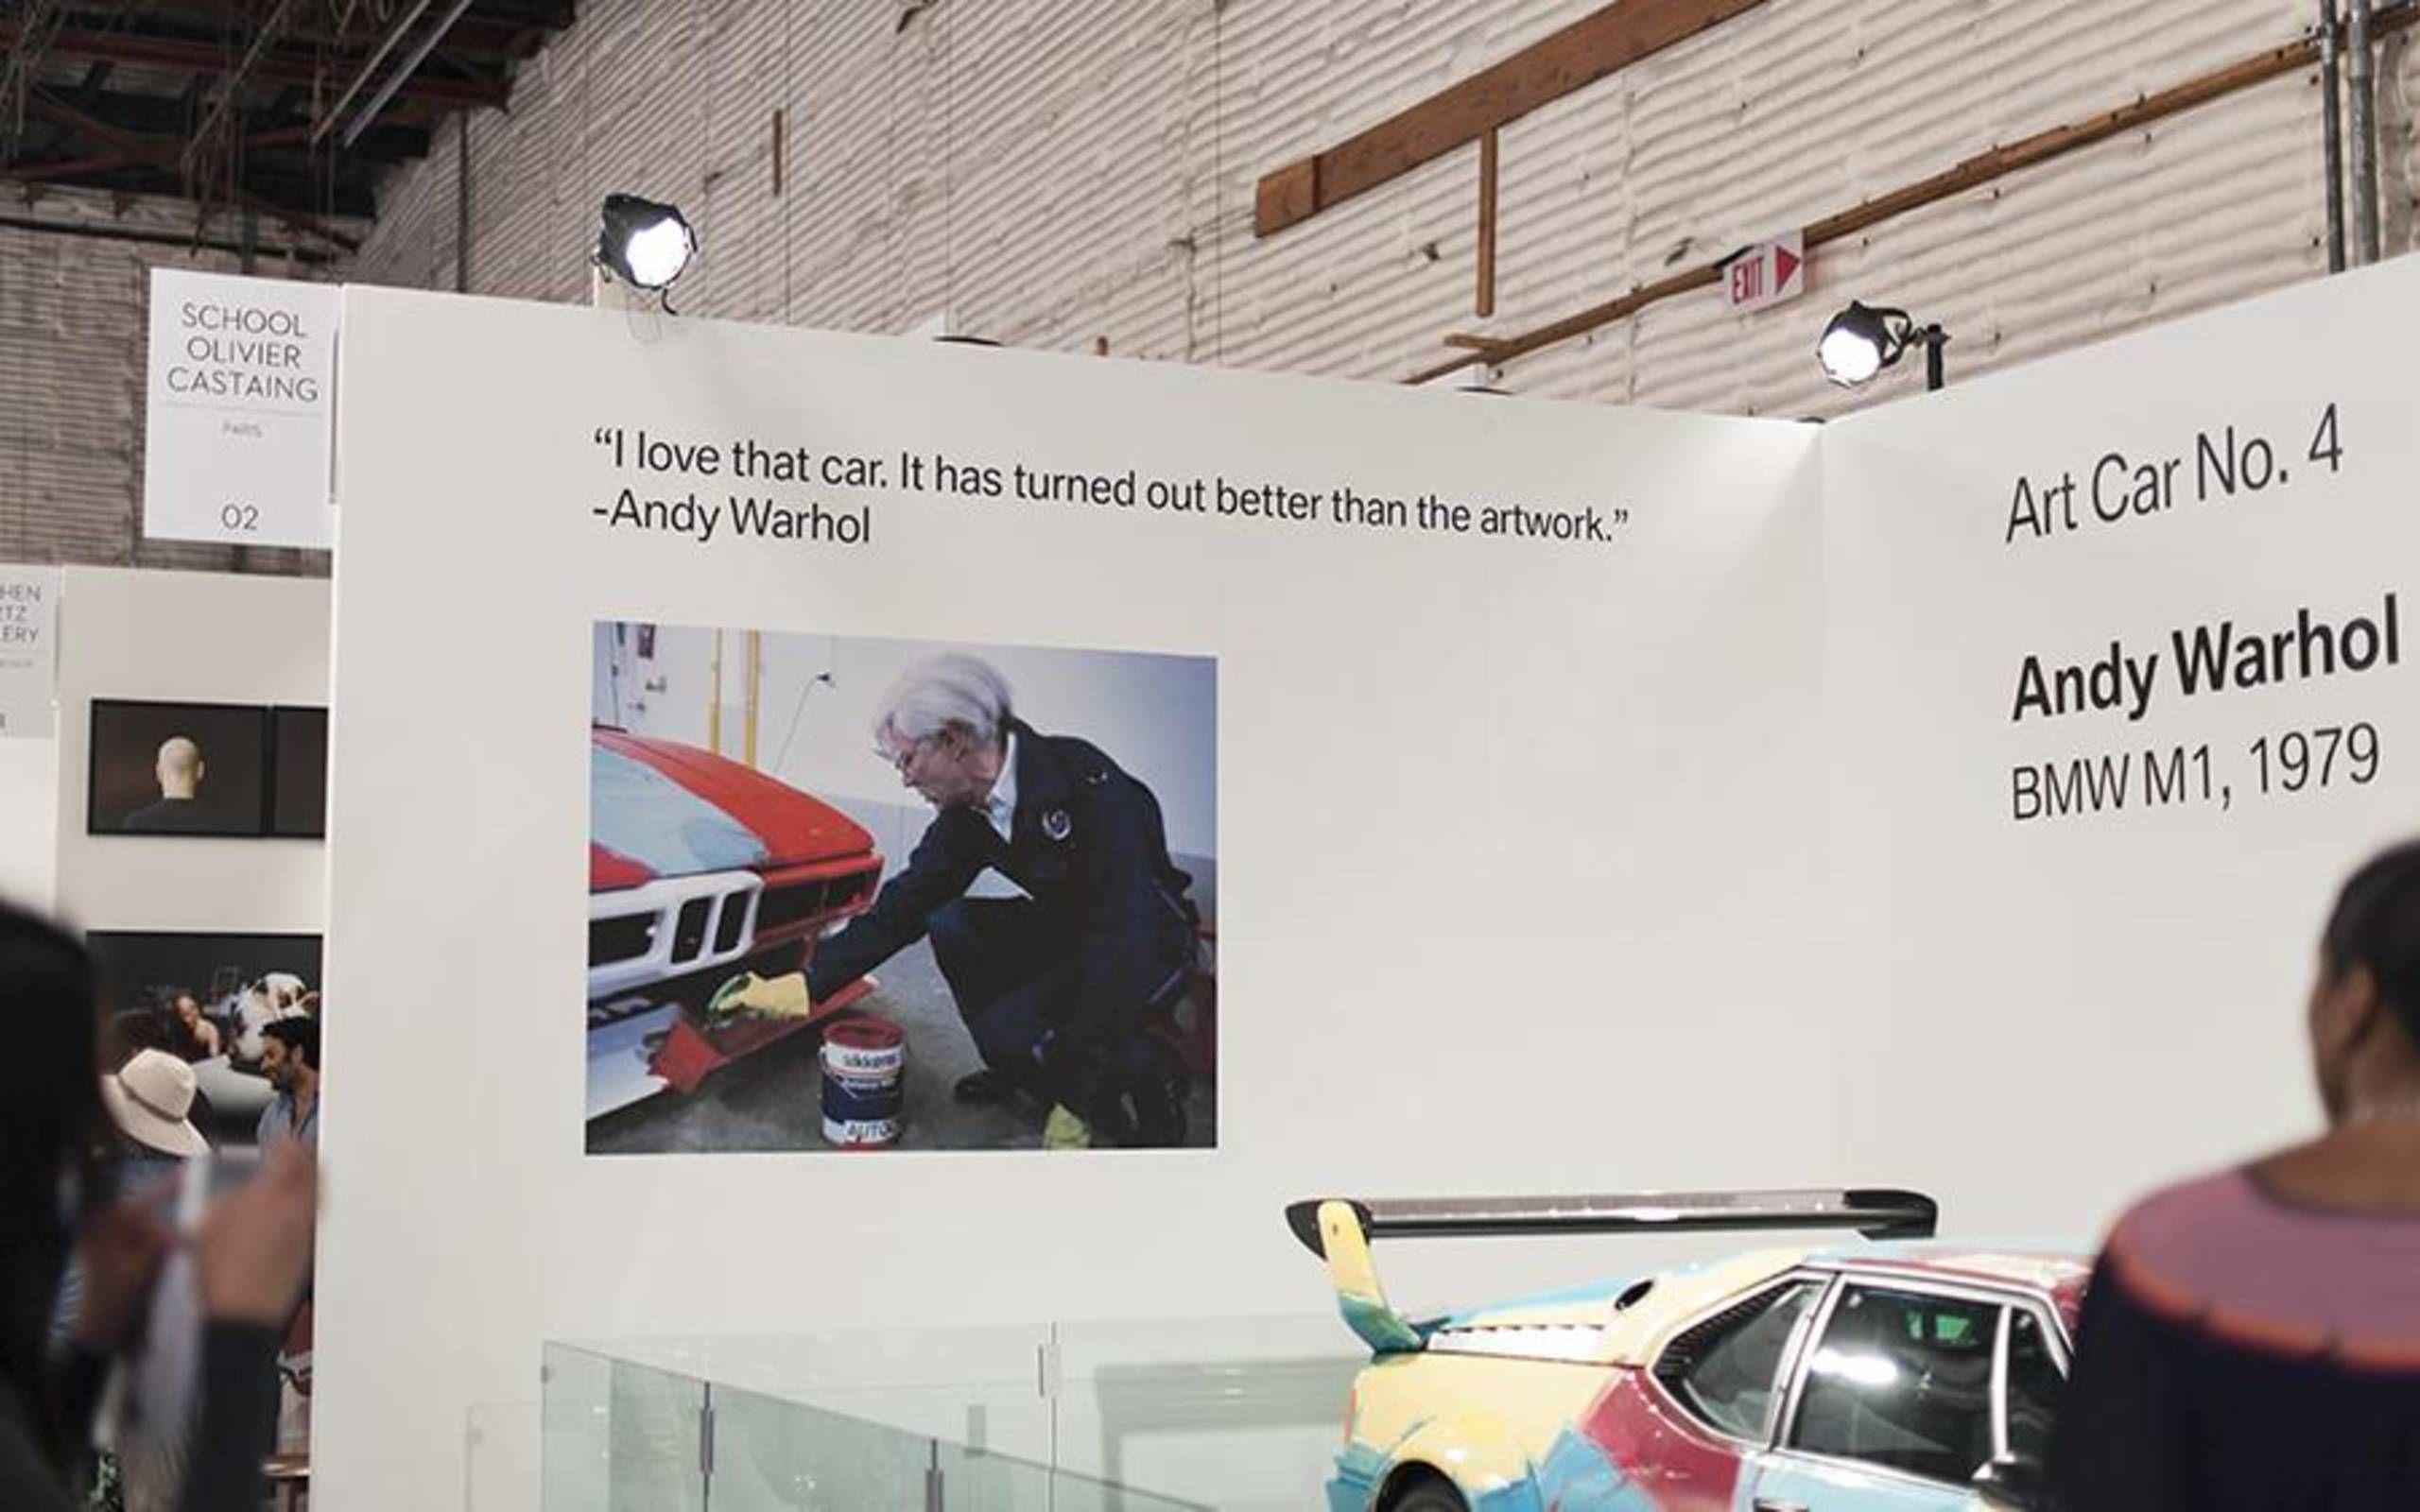 Думите на Анди Уорхол.